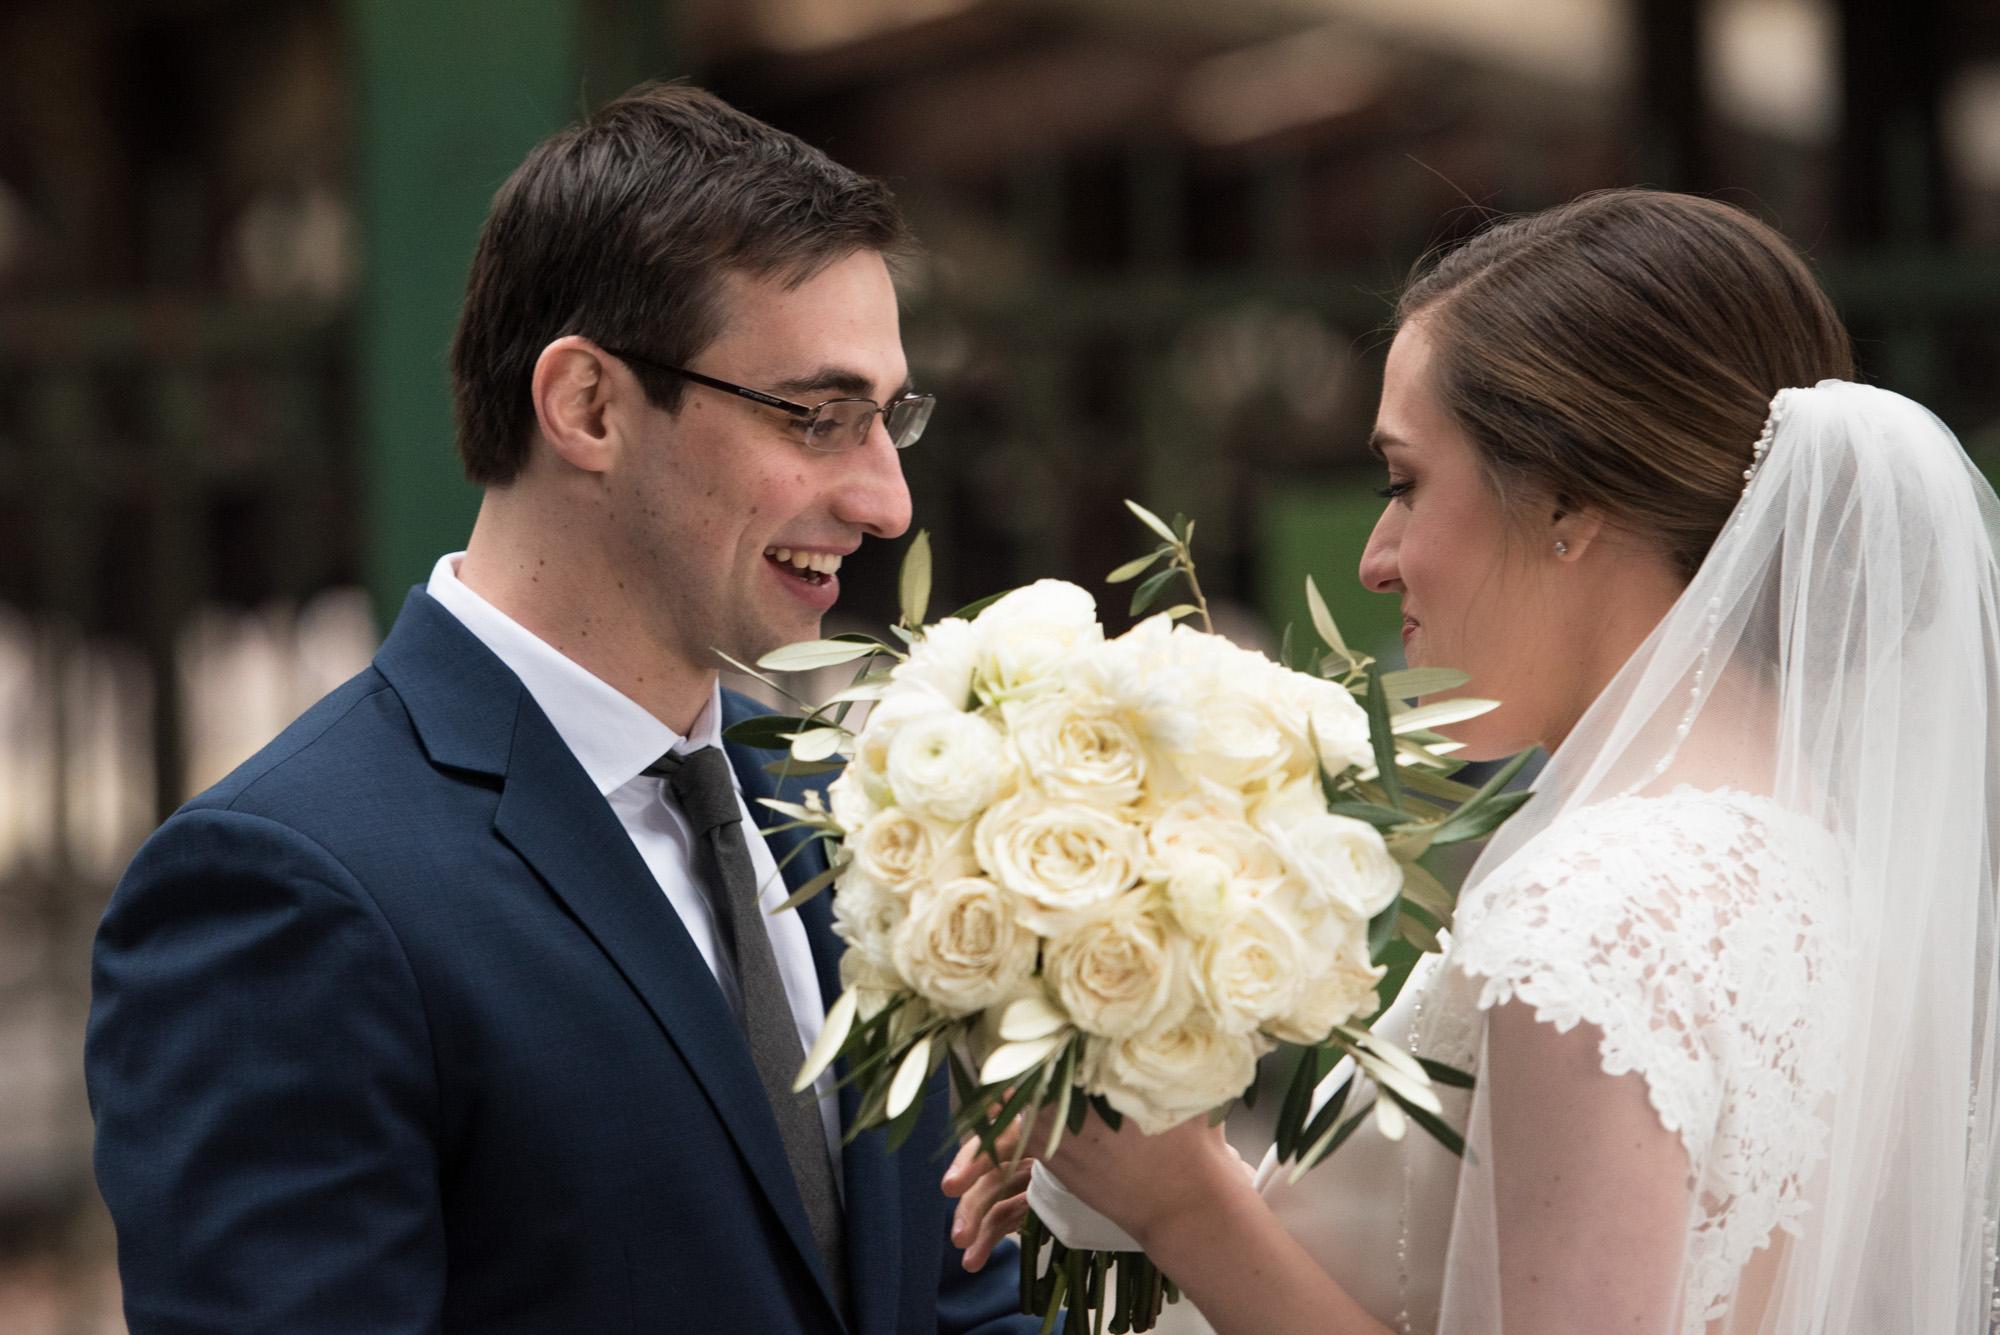 nj-wedding-photographer-maritime-parc-maria-david-20.jpg